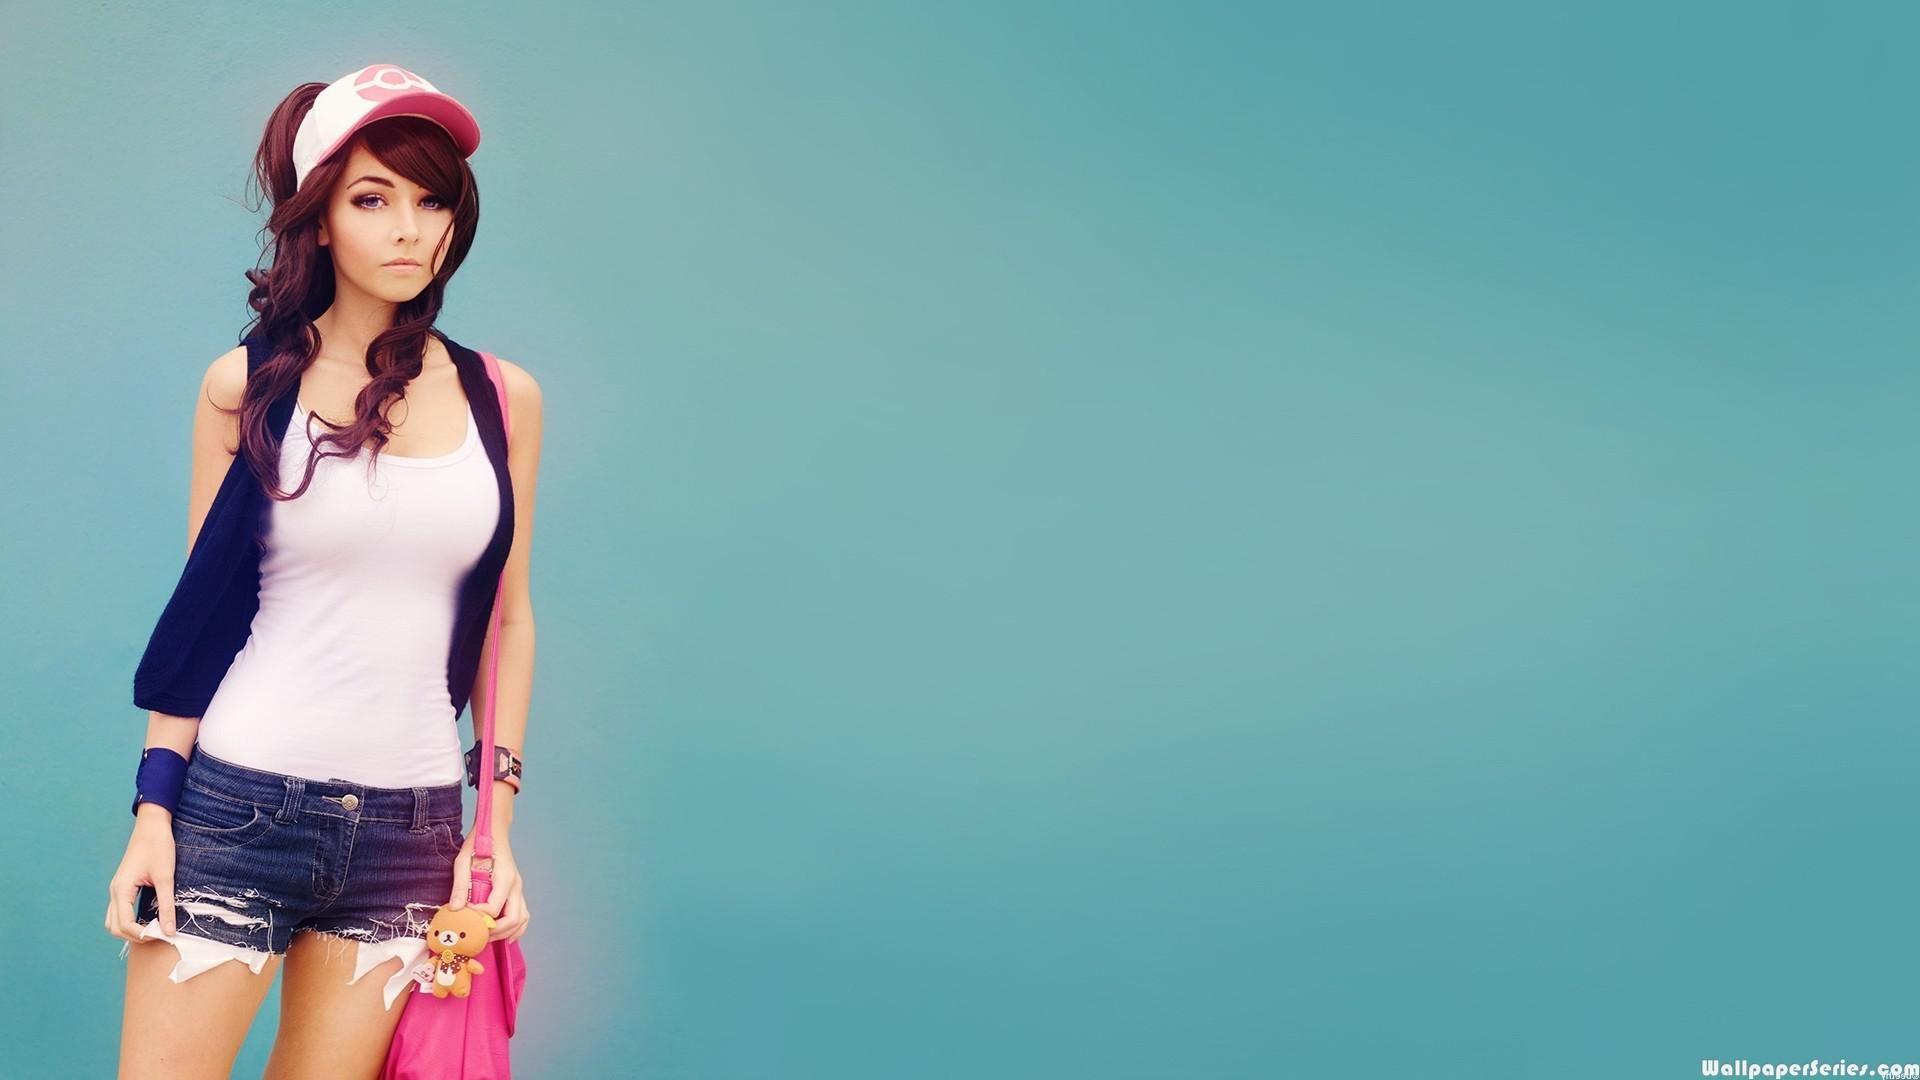 gb world cute girl - photo #23